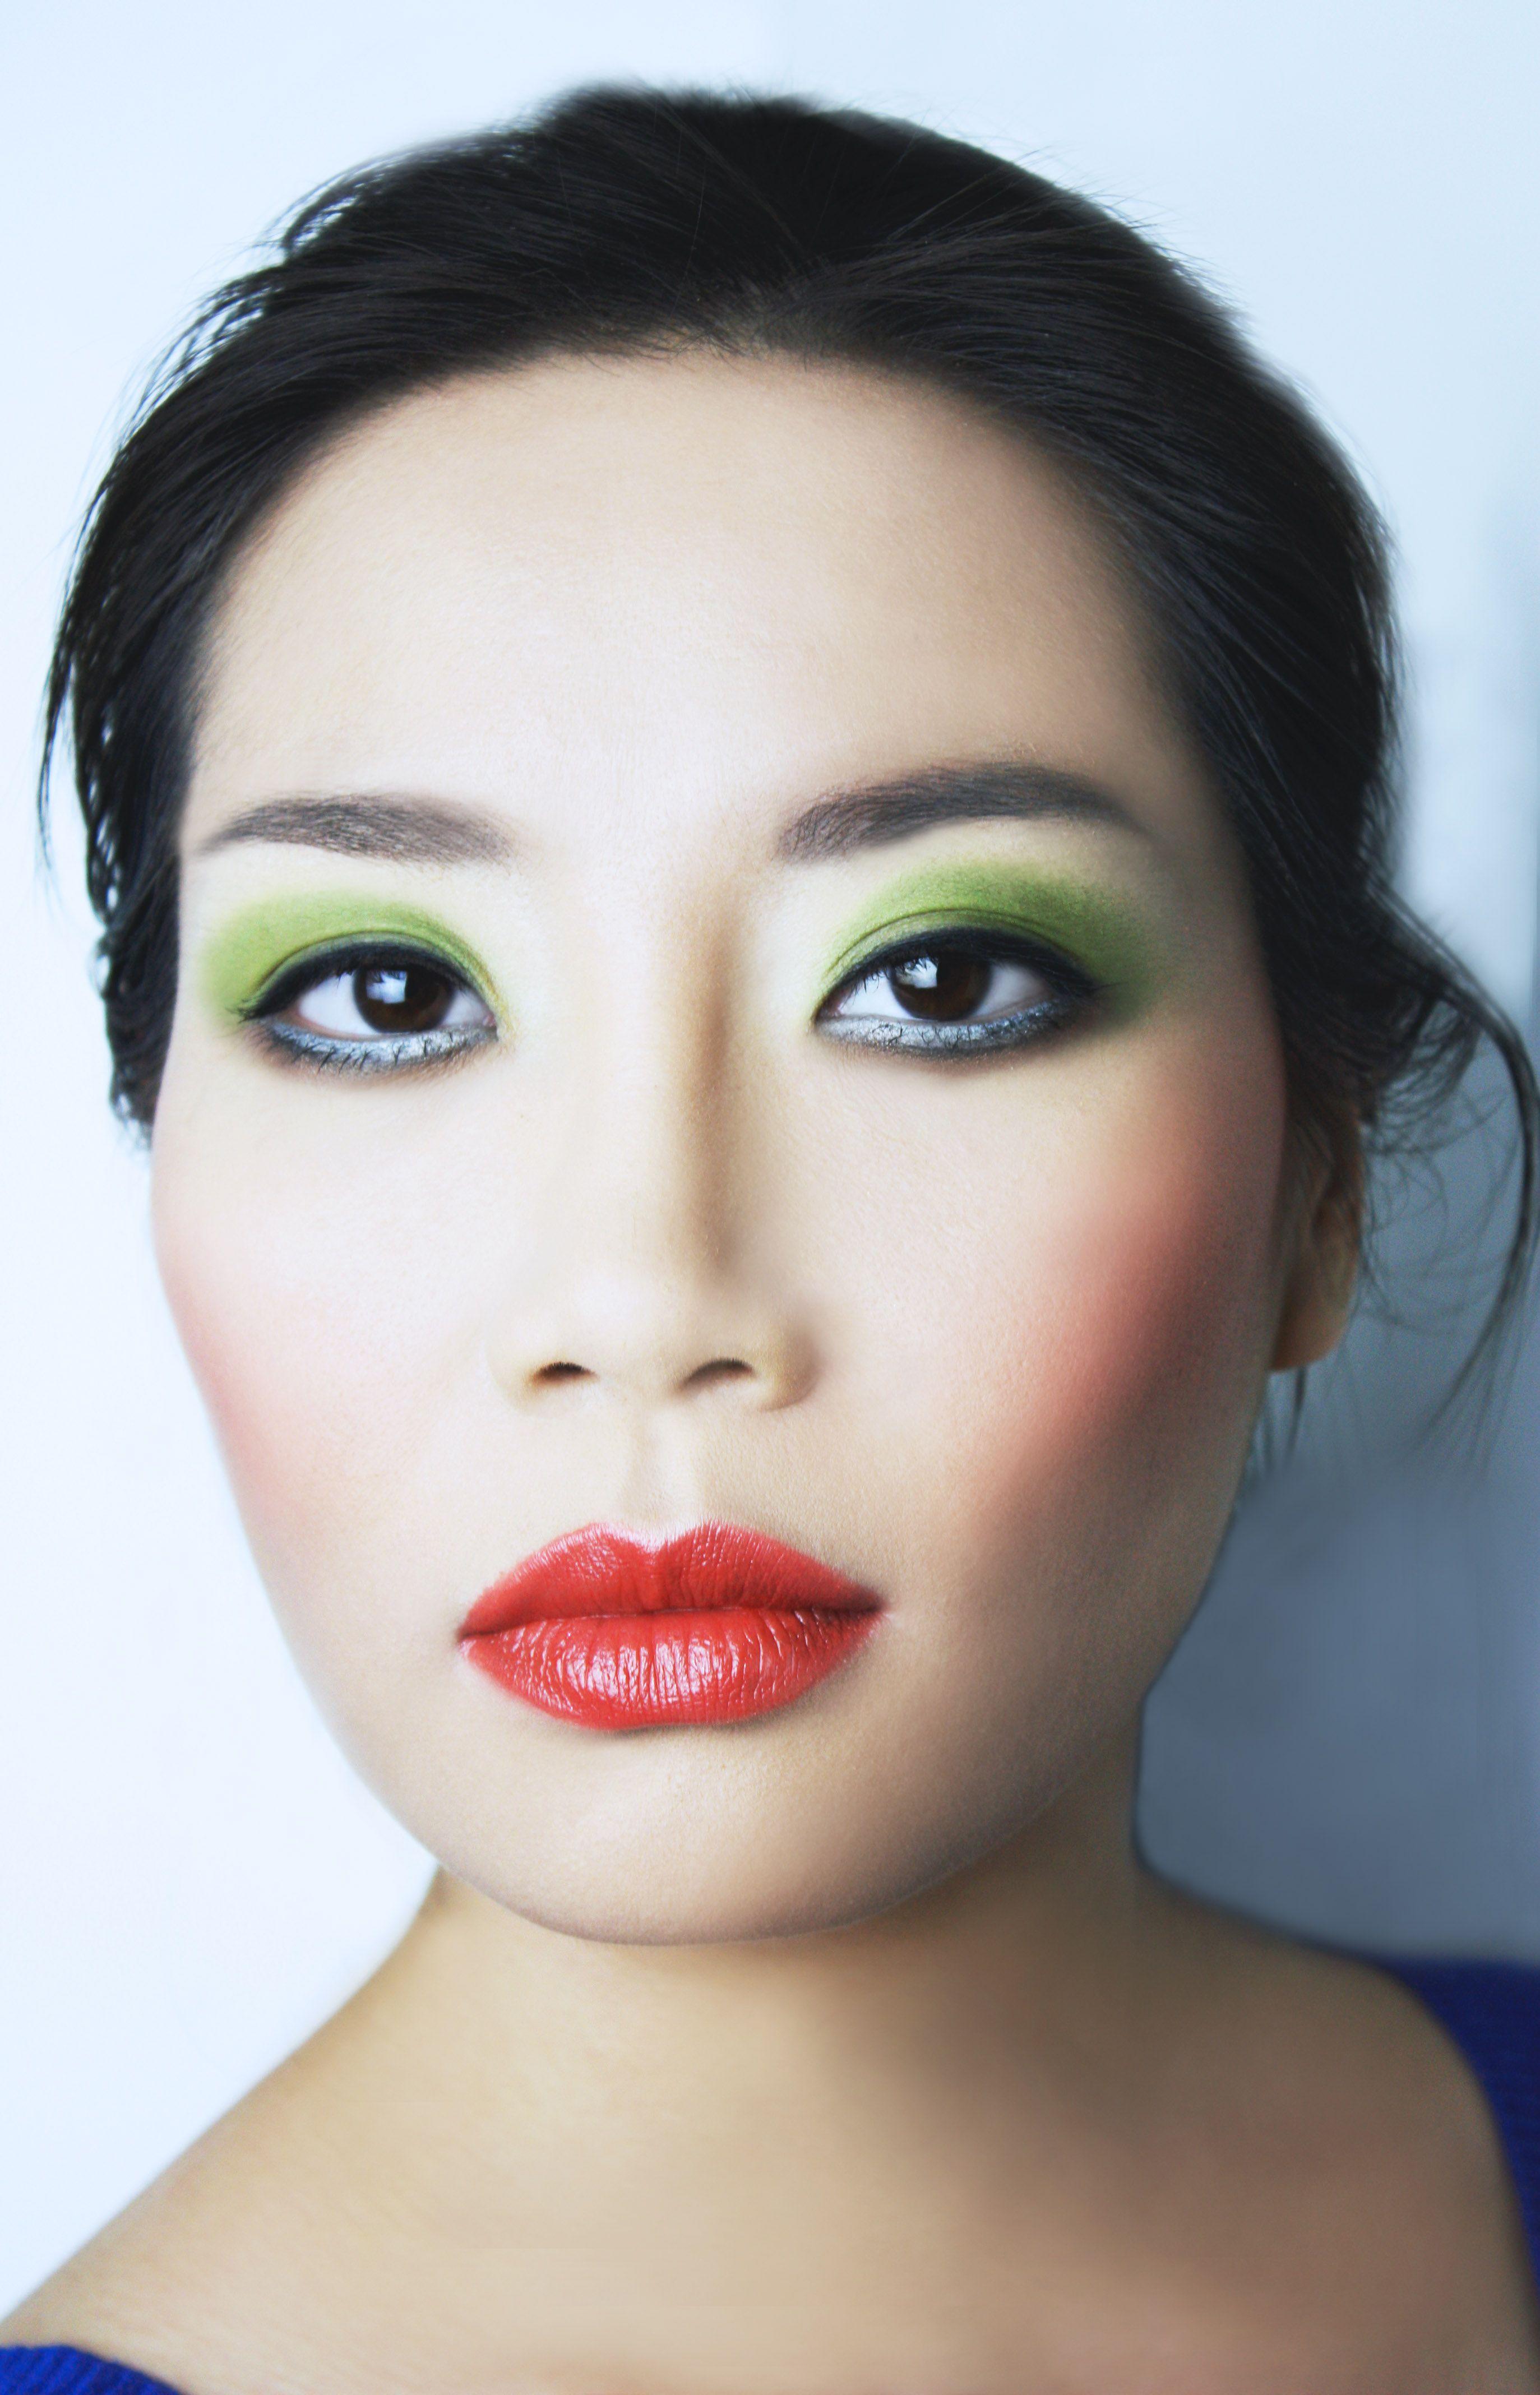 Asian Beauty look Modern Runway Bright Green shadow and